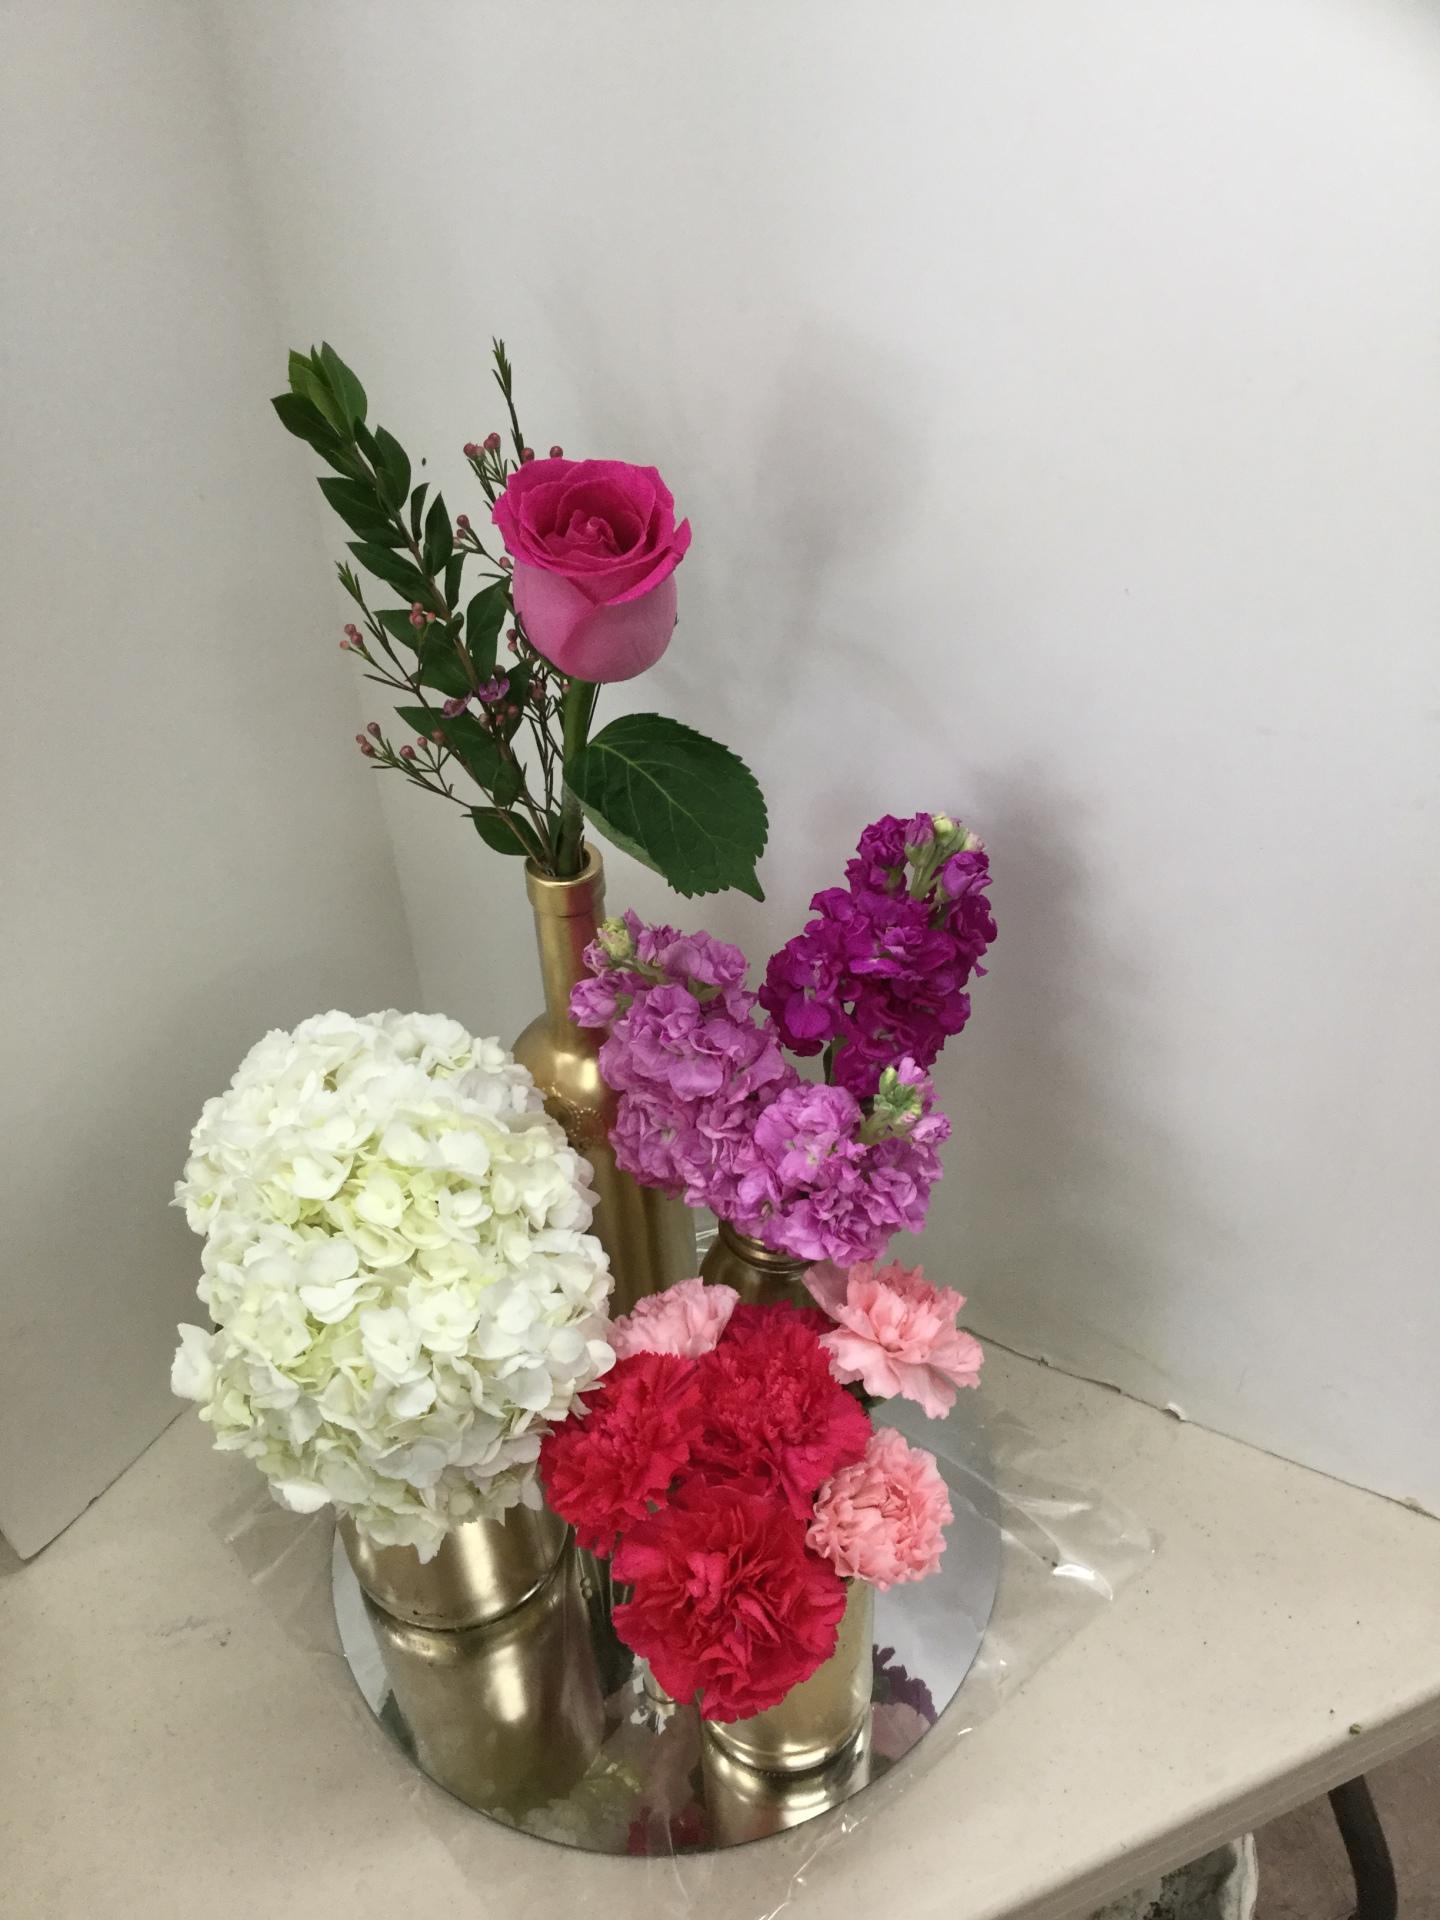 Wedding Centerpieces - Cluster of Vases